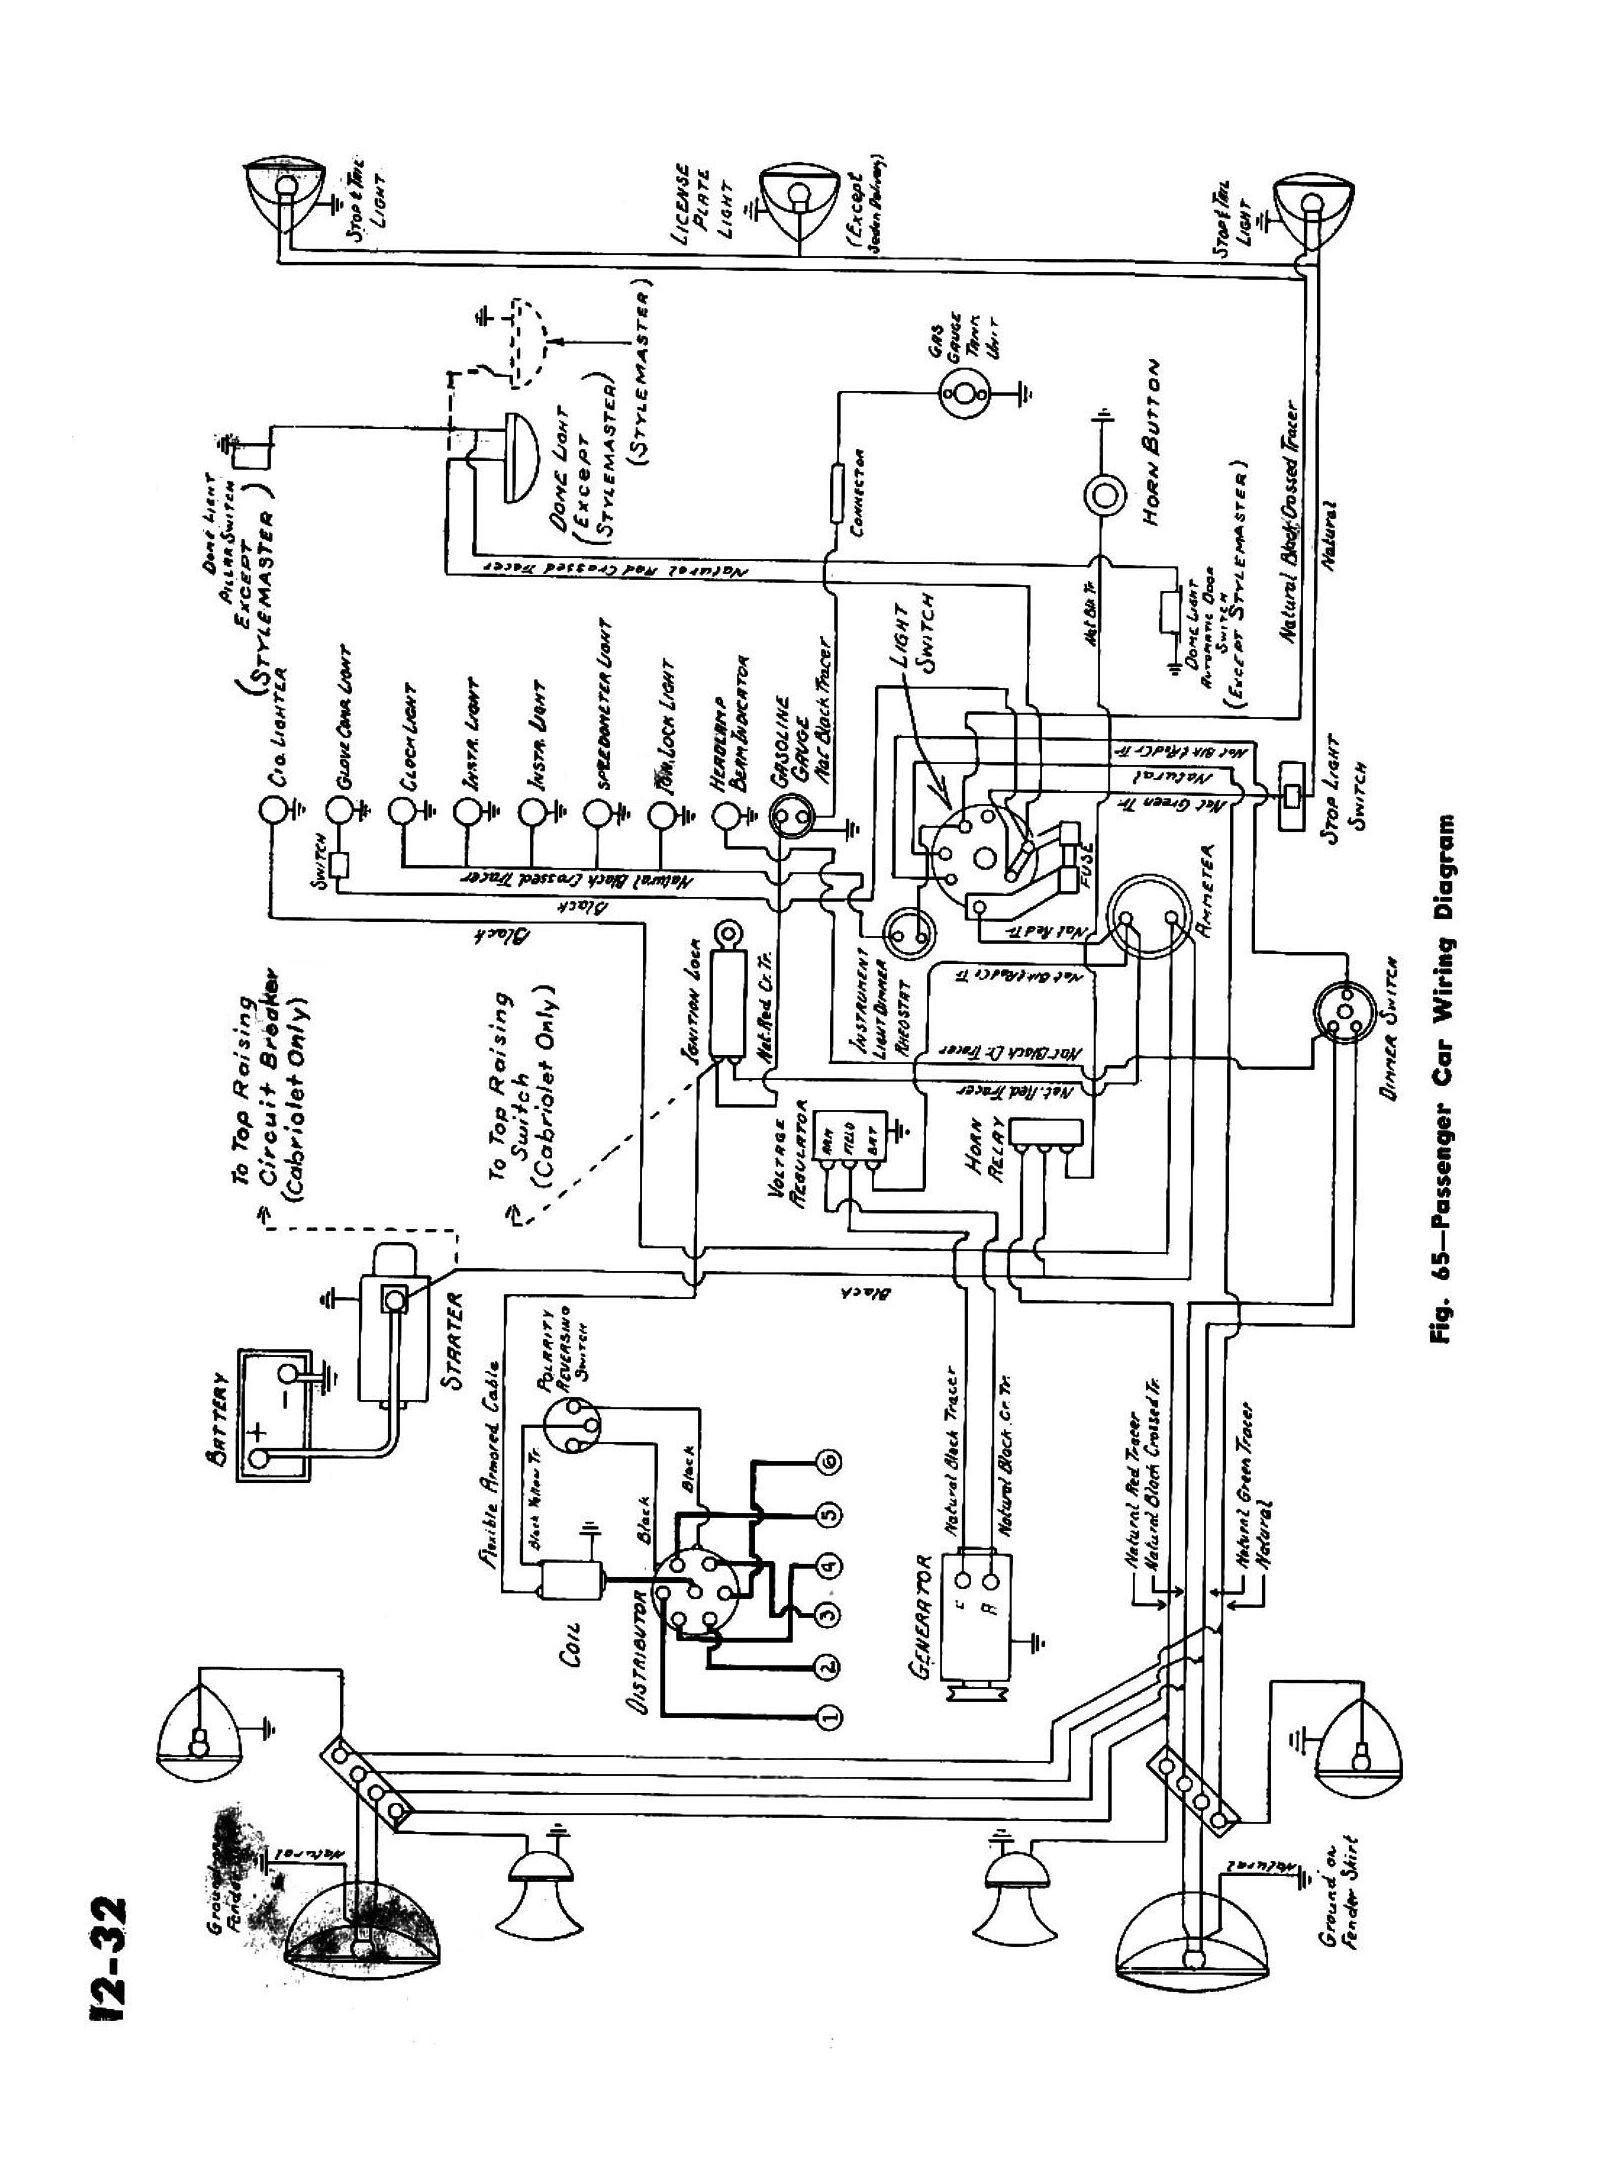 Schematic symbols chart wiring diargram schematic symbols from on automotive wiring diagram legend vehicle wiring diagram symbols Automotive Electrical Diagrams